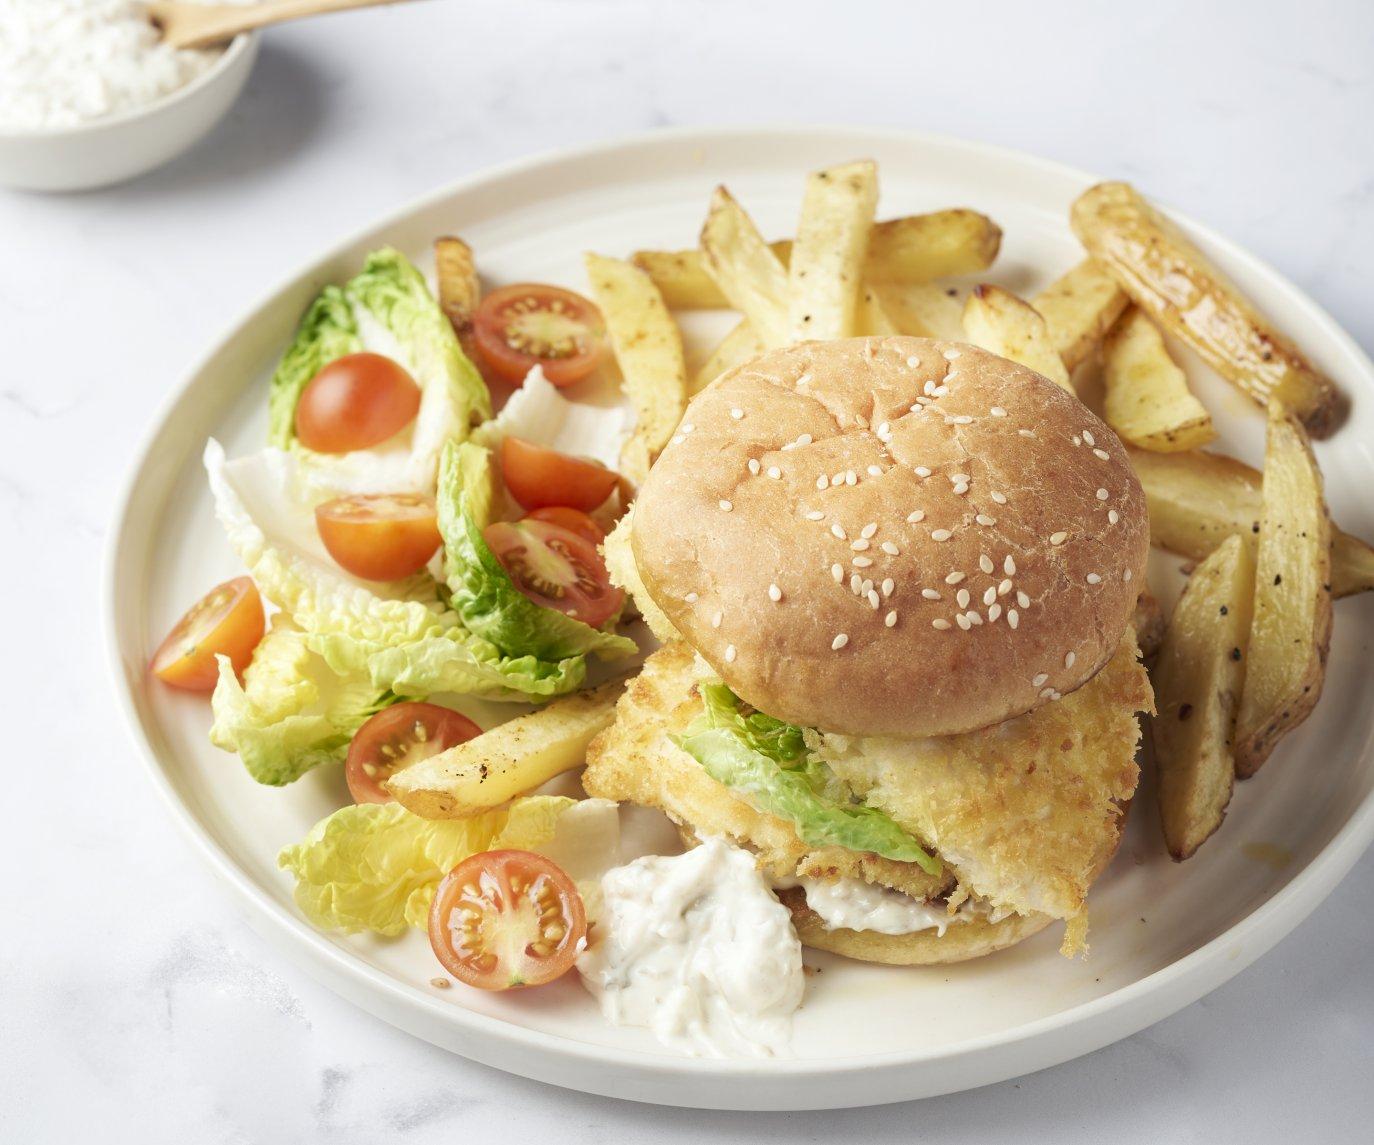 Crispy fishburger met kappertjesmayonaise en aardappelwedges